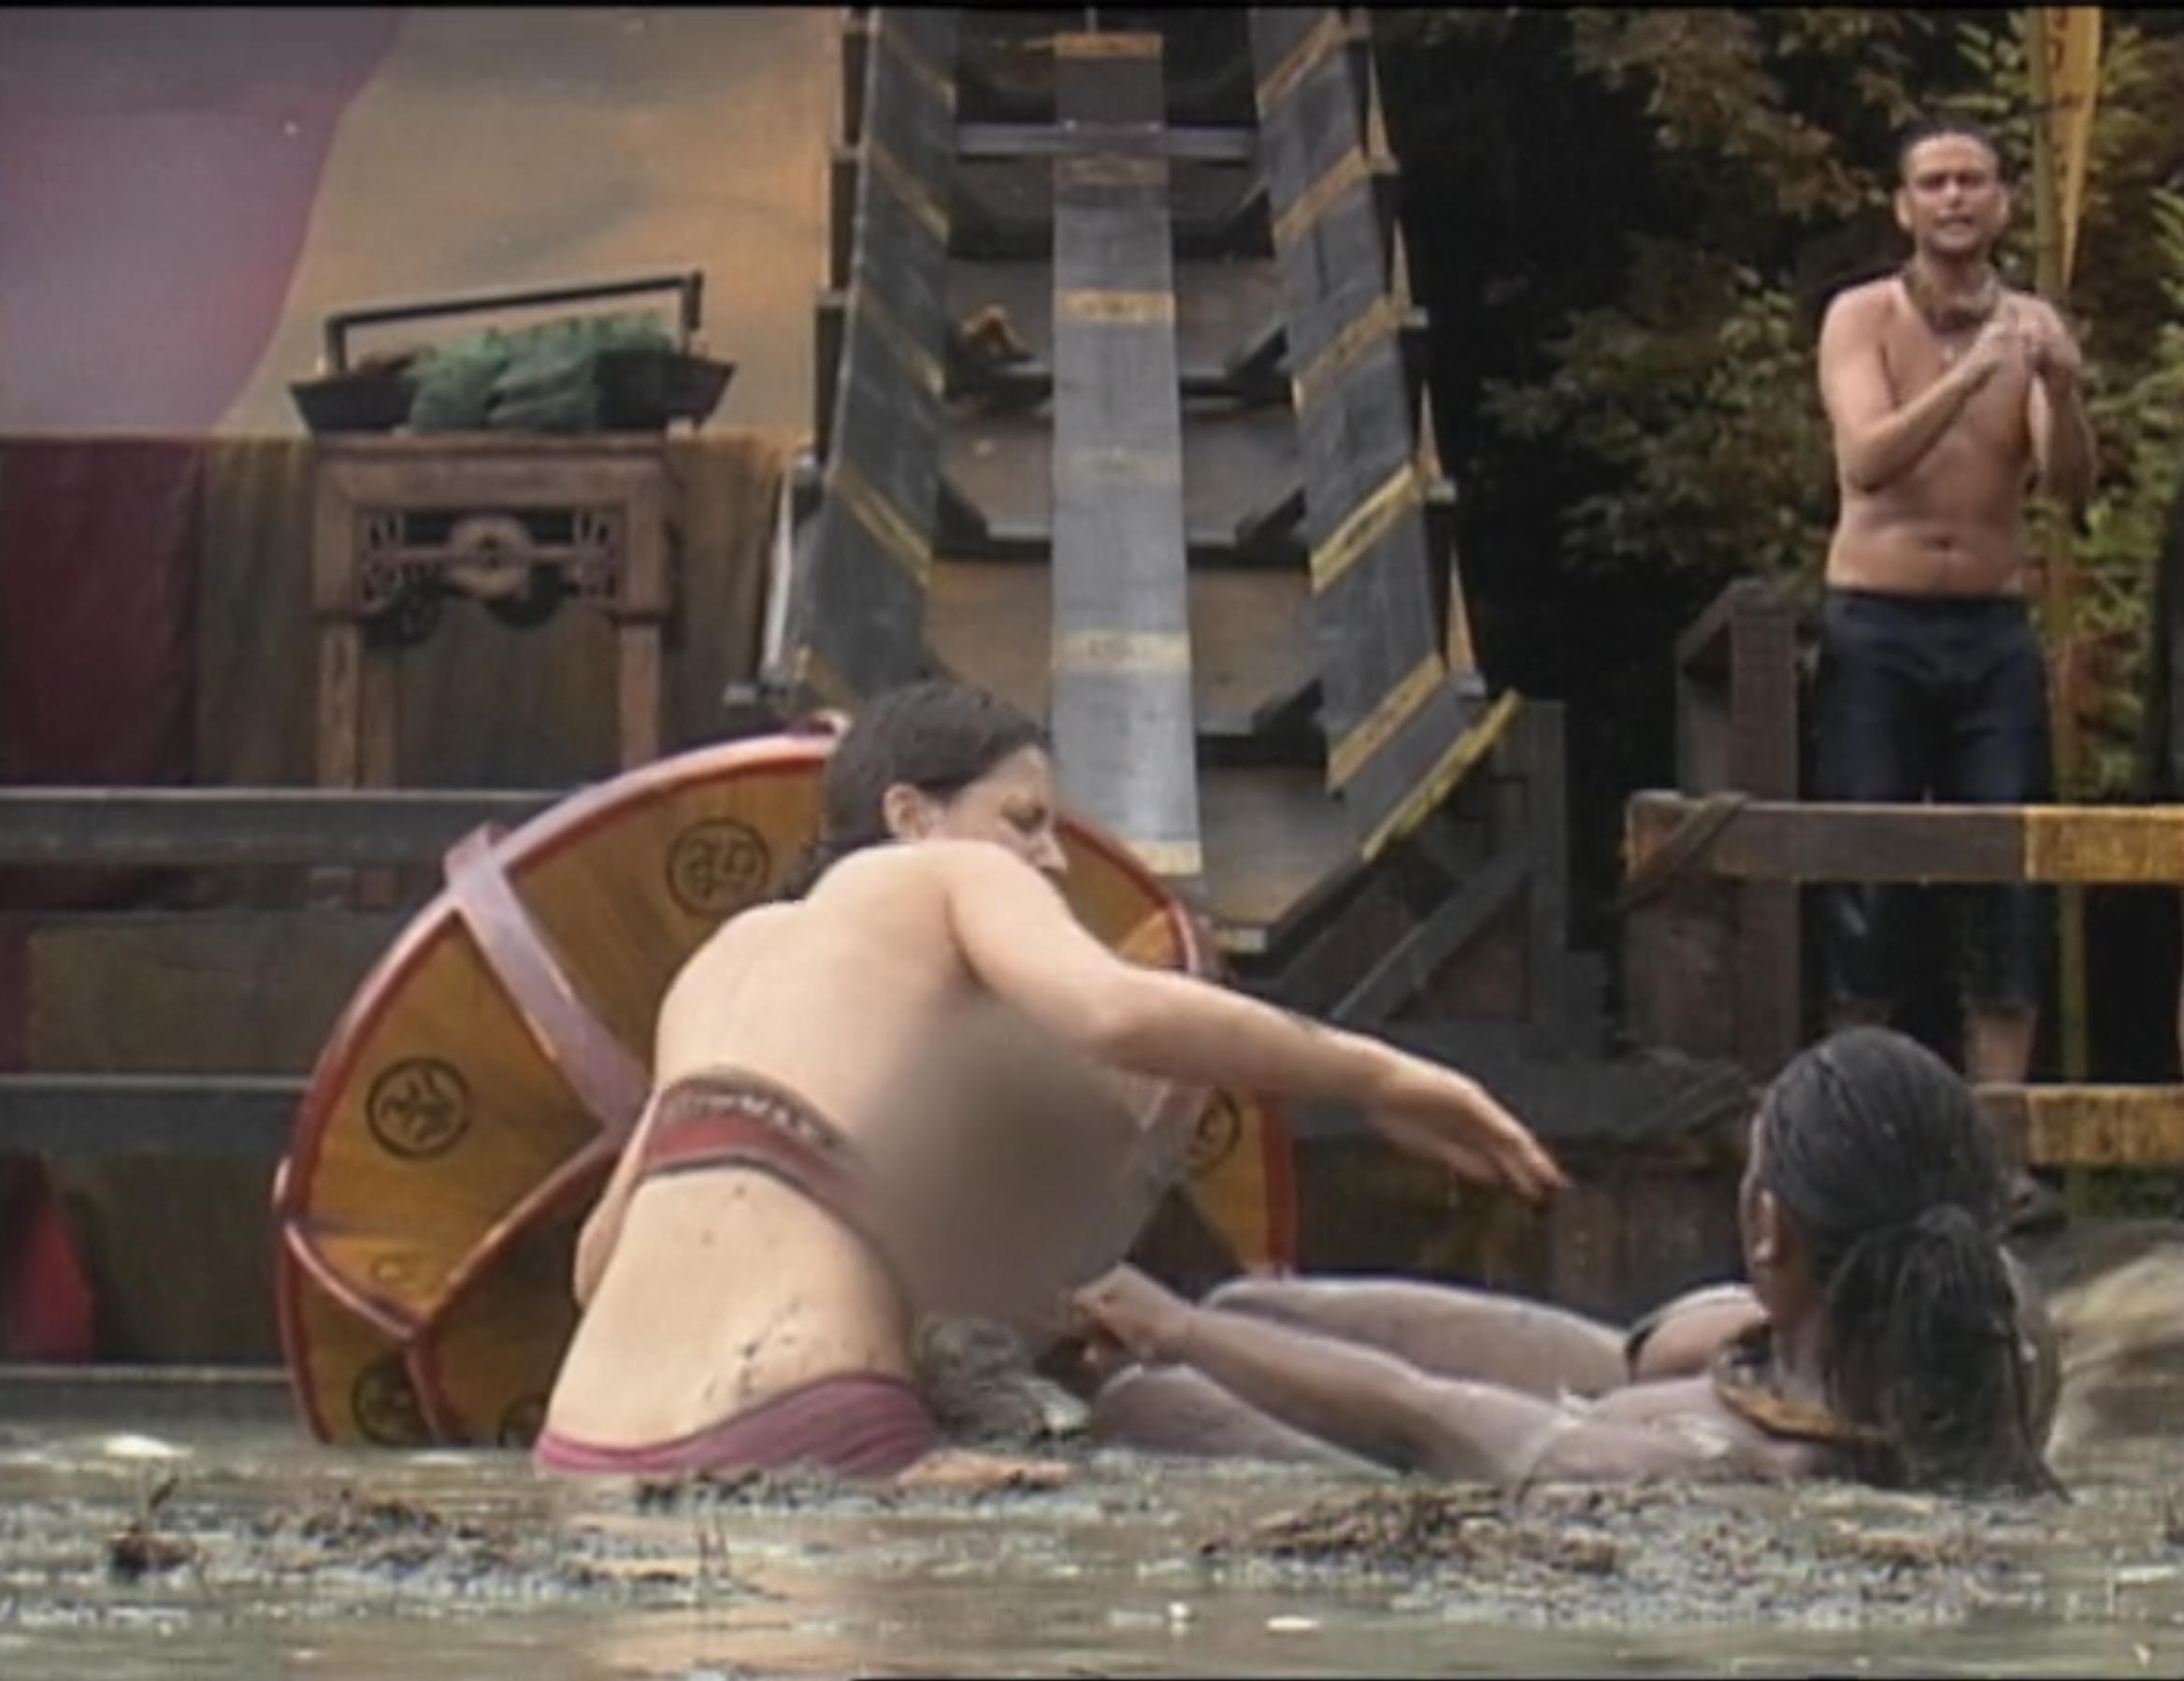 Amanda Kimmel wrestles with Sherea Lloyd in the mud on Survivor: China